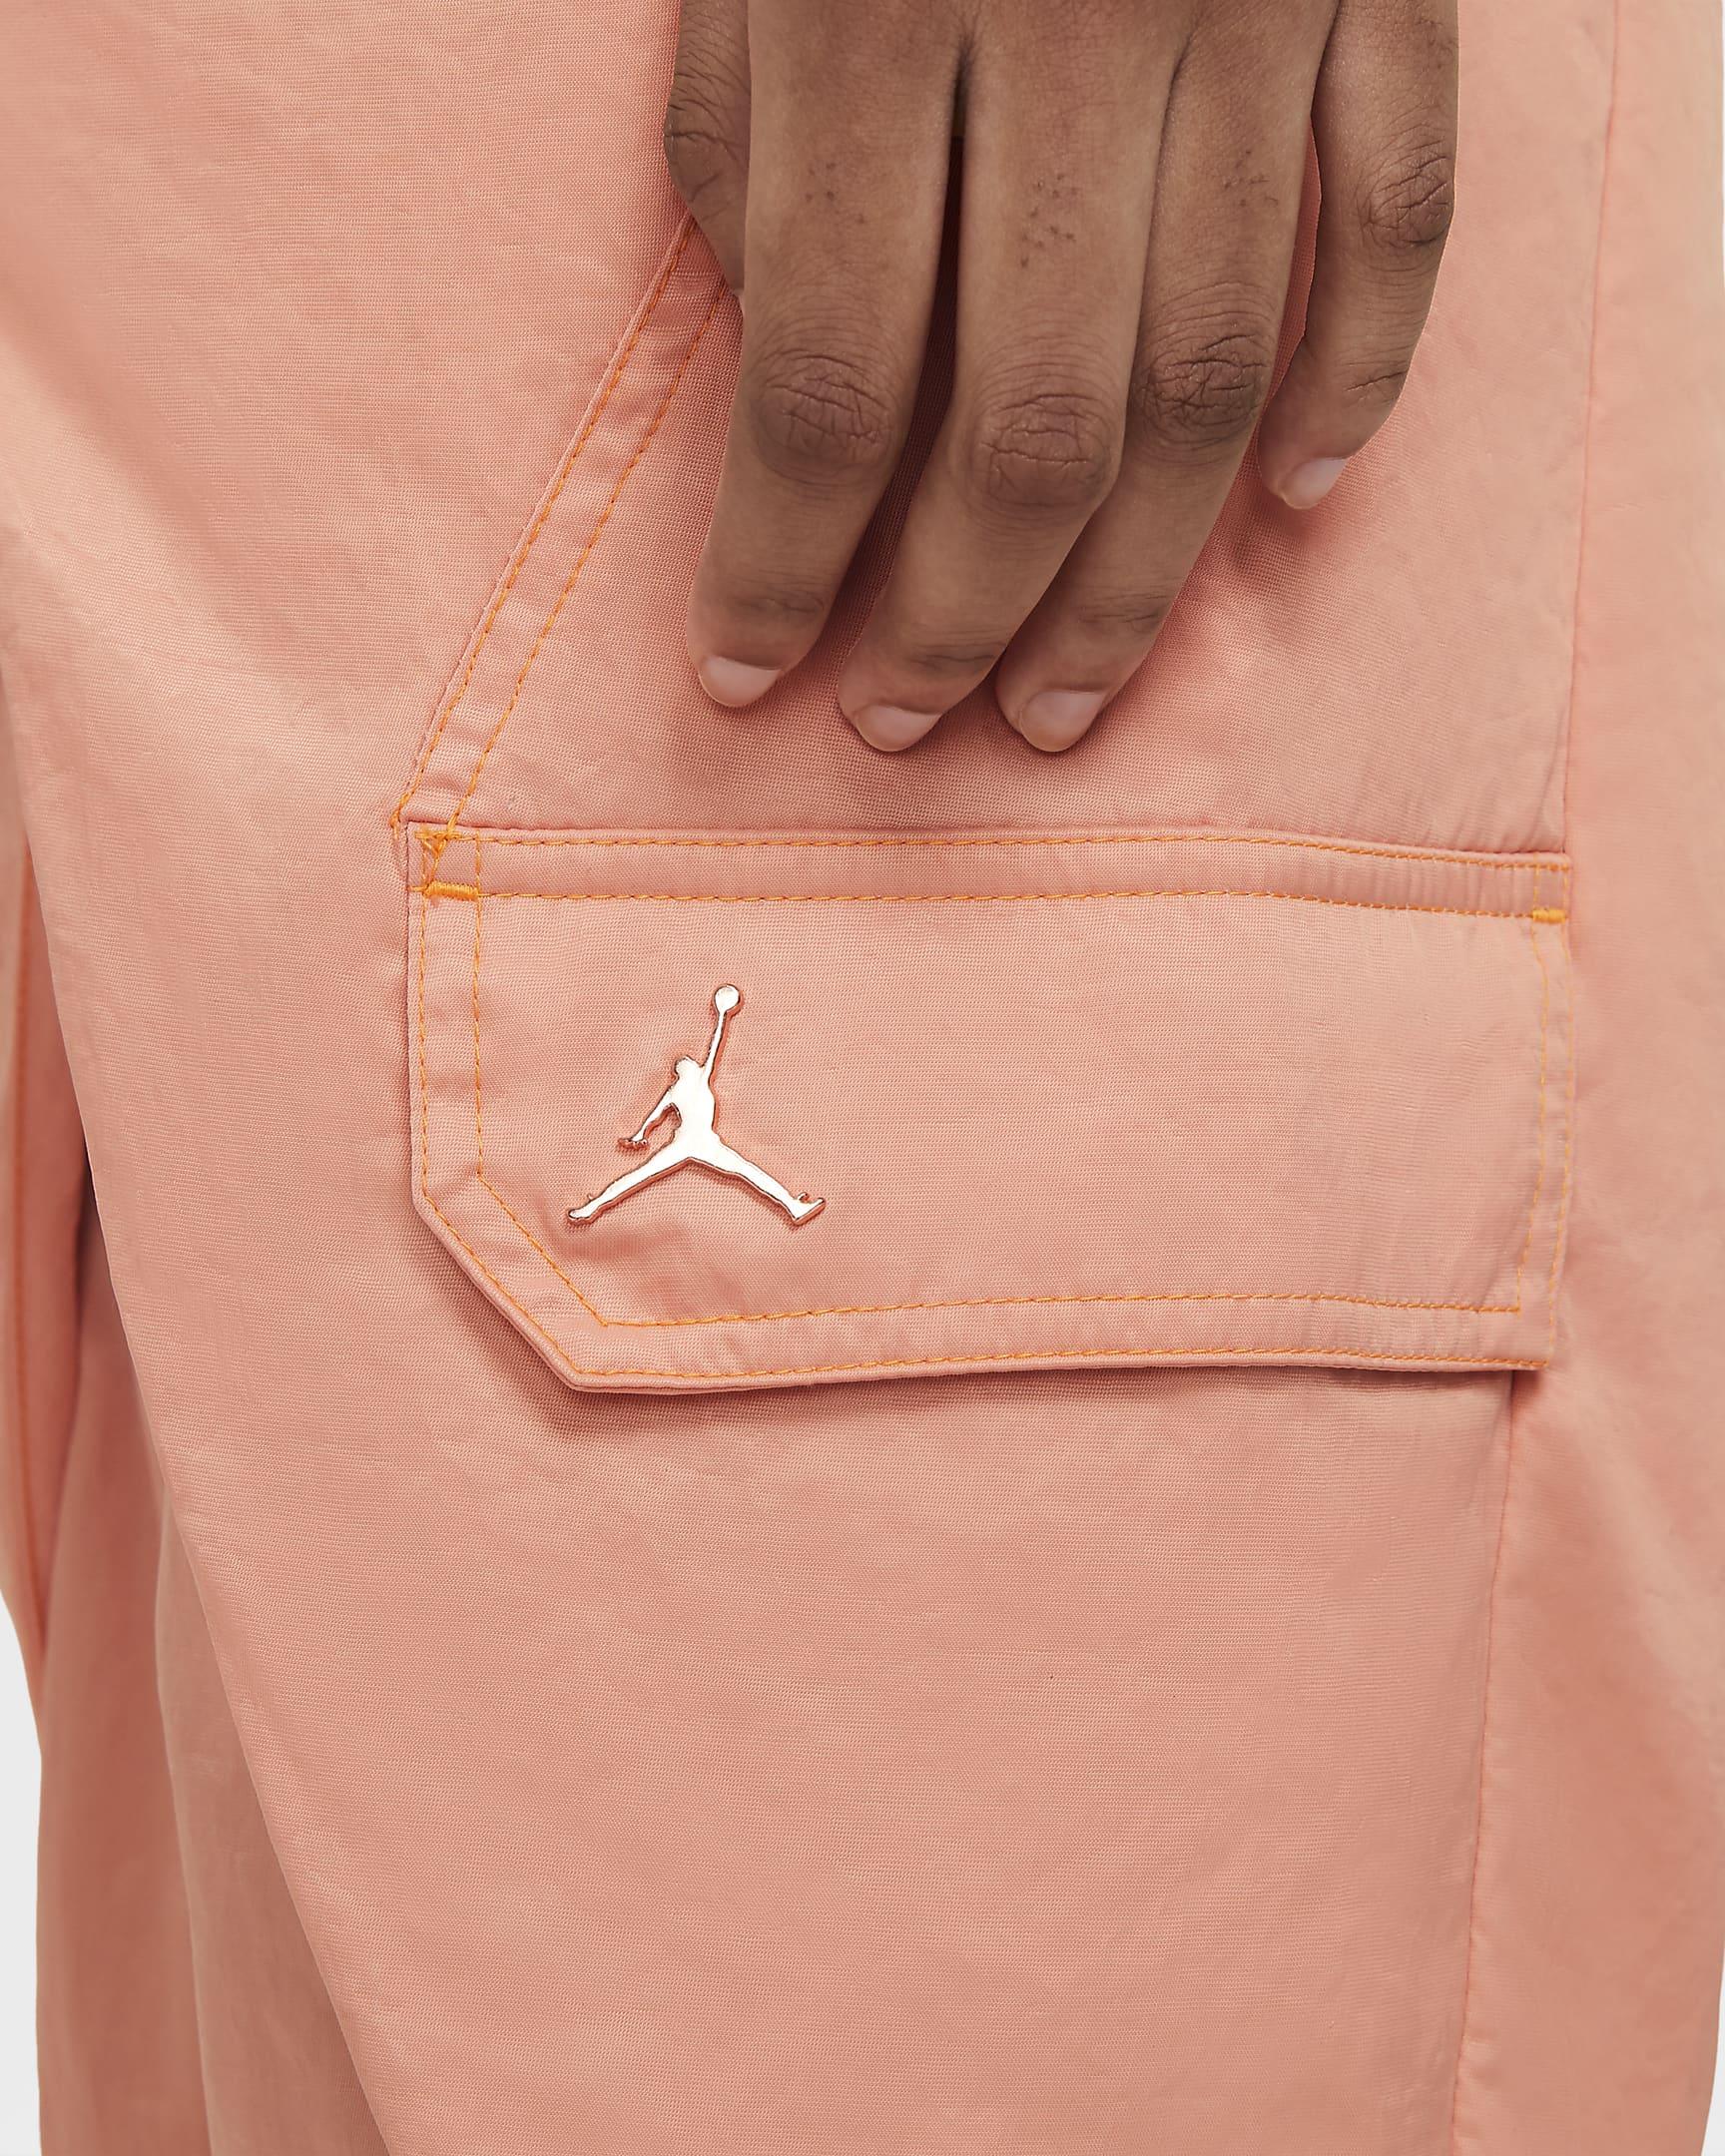 jordan-future-primal-womens-flight-suit-jxjT6b-1